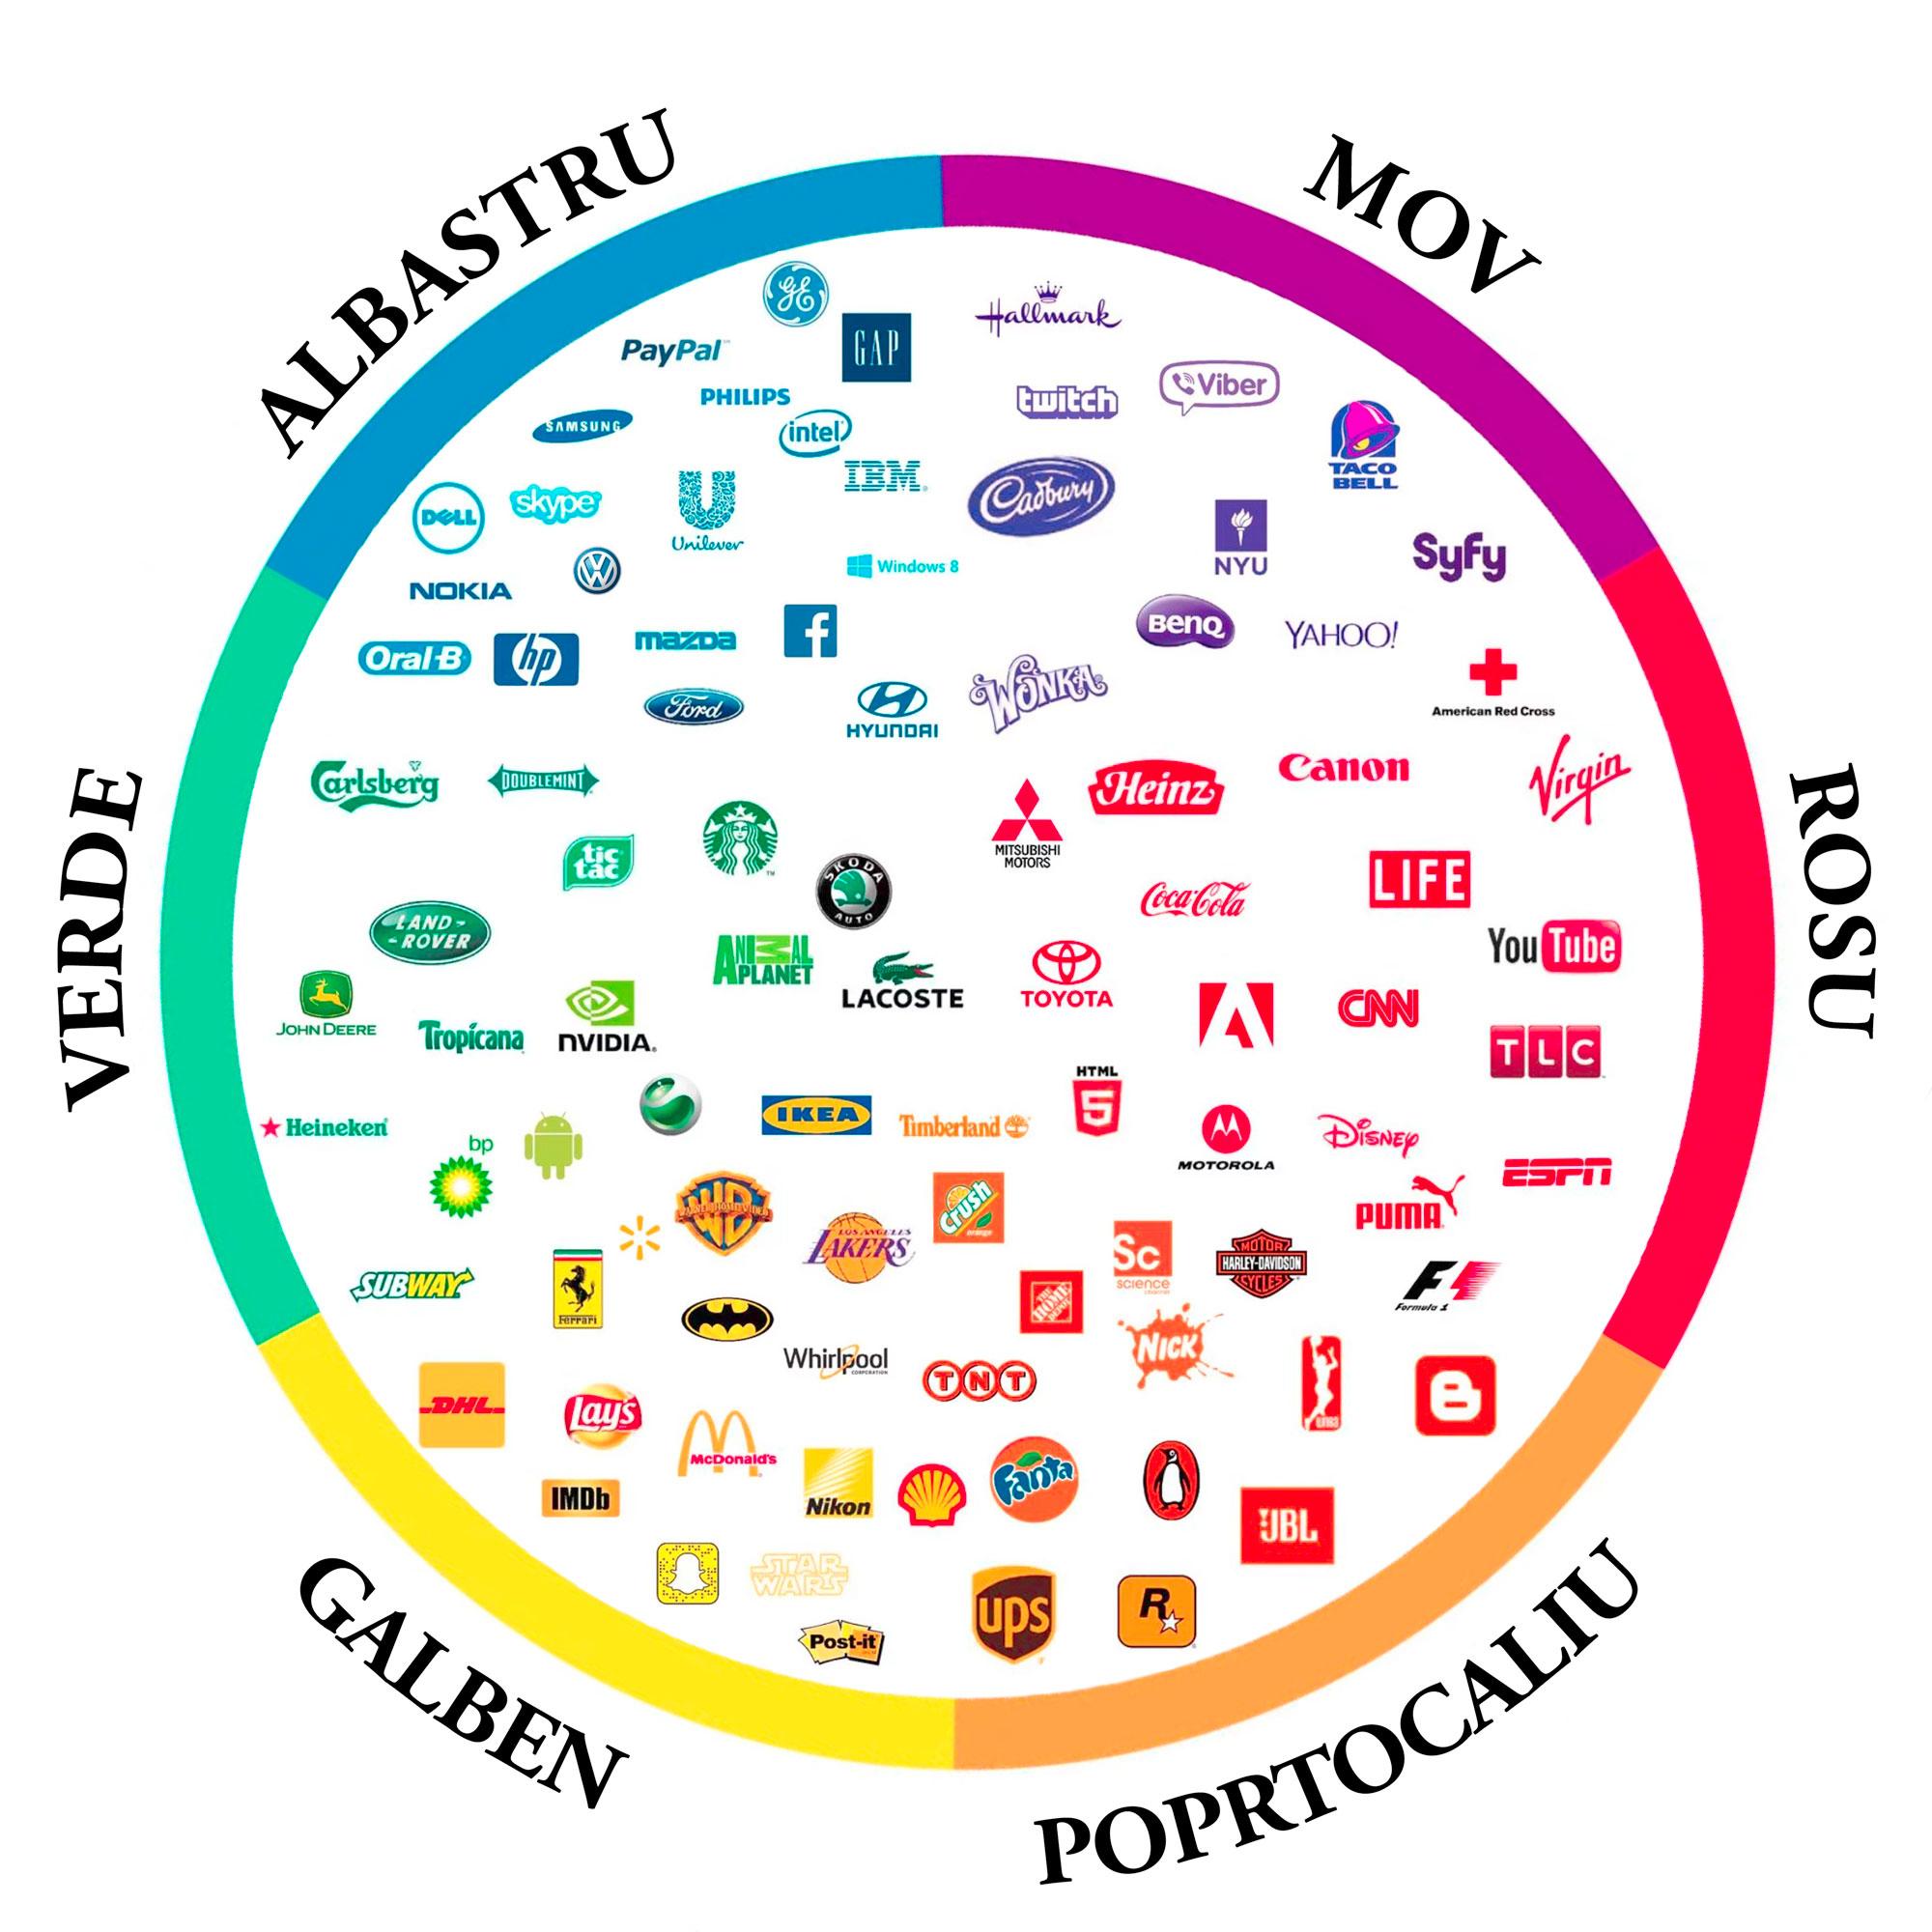 culori-logo-rotund.jpg